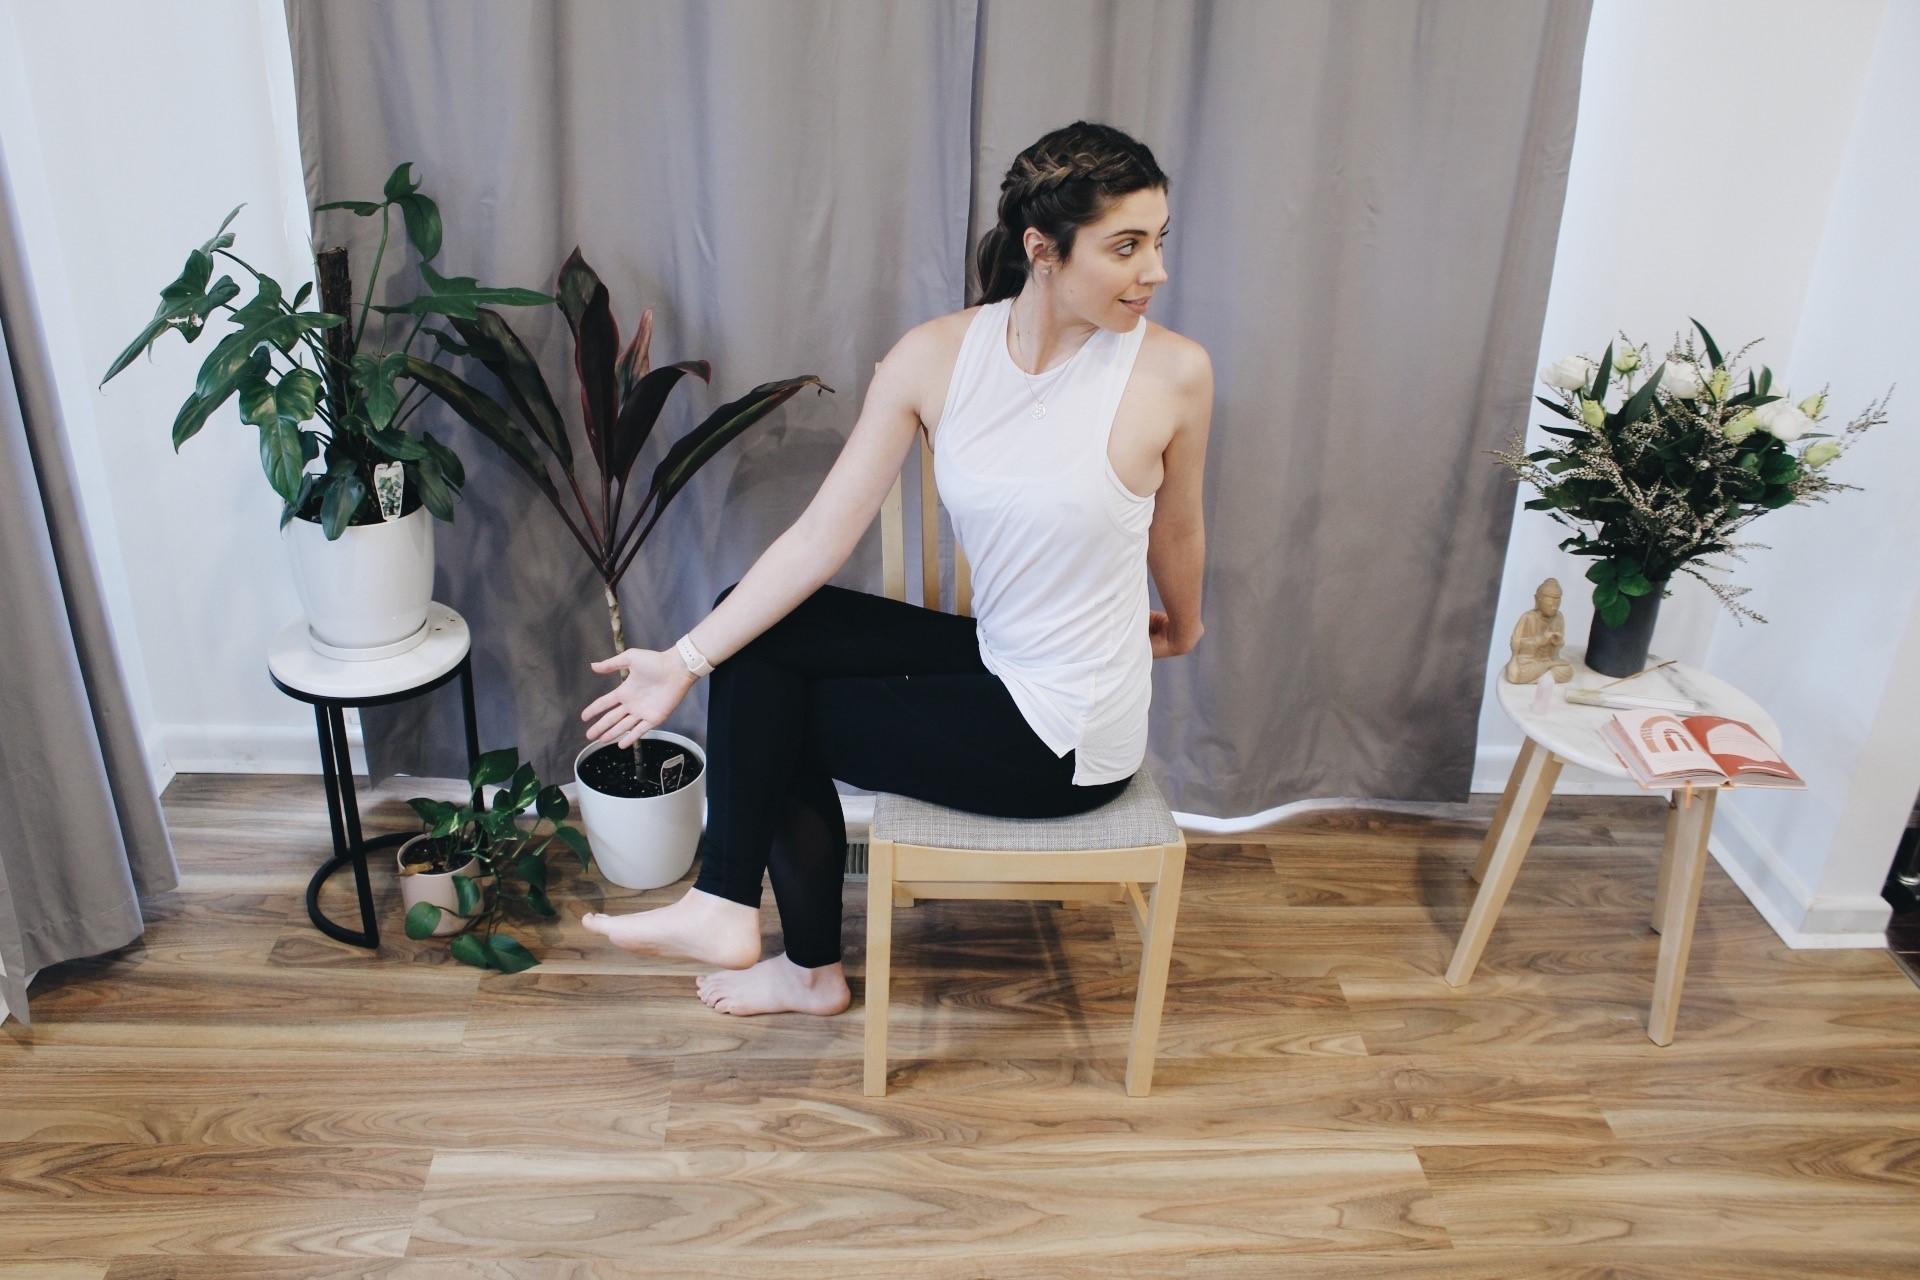 Desk Yoga with Three Point Yoga